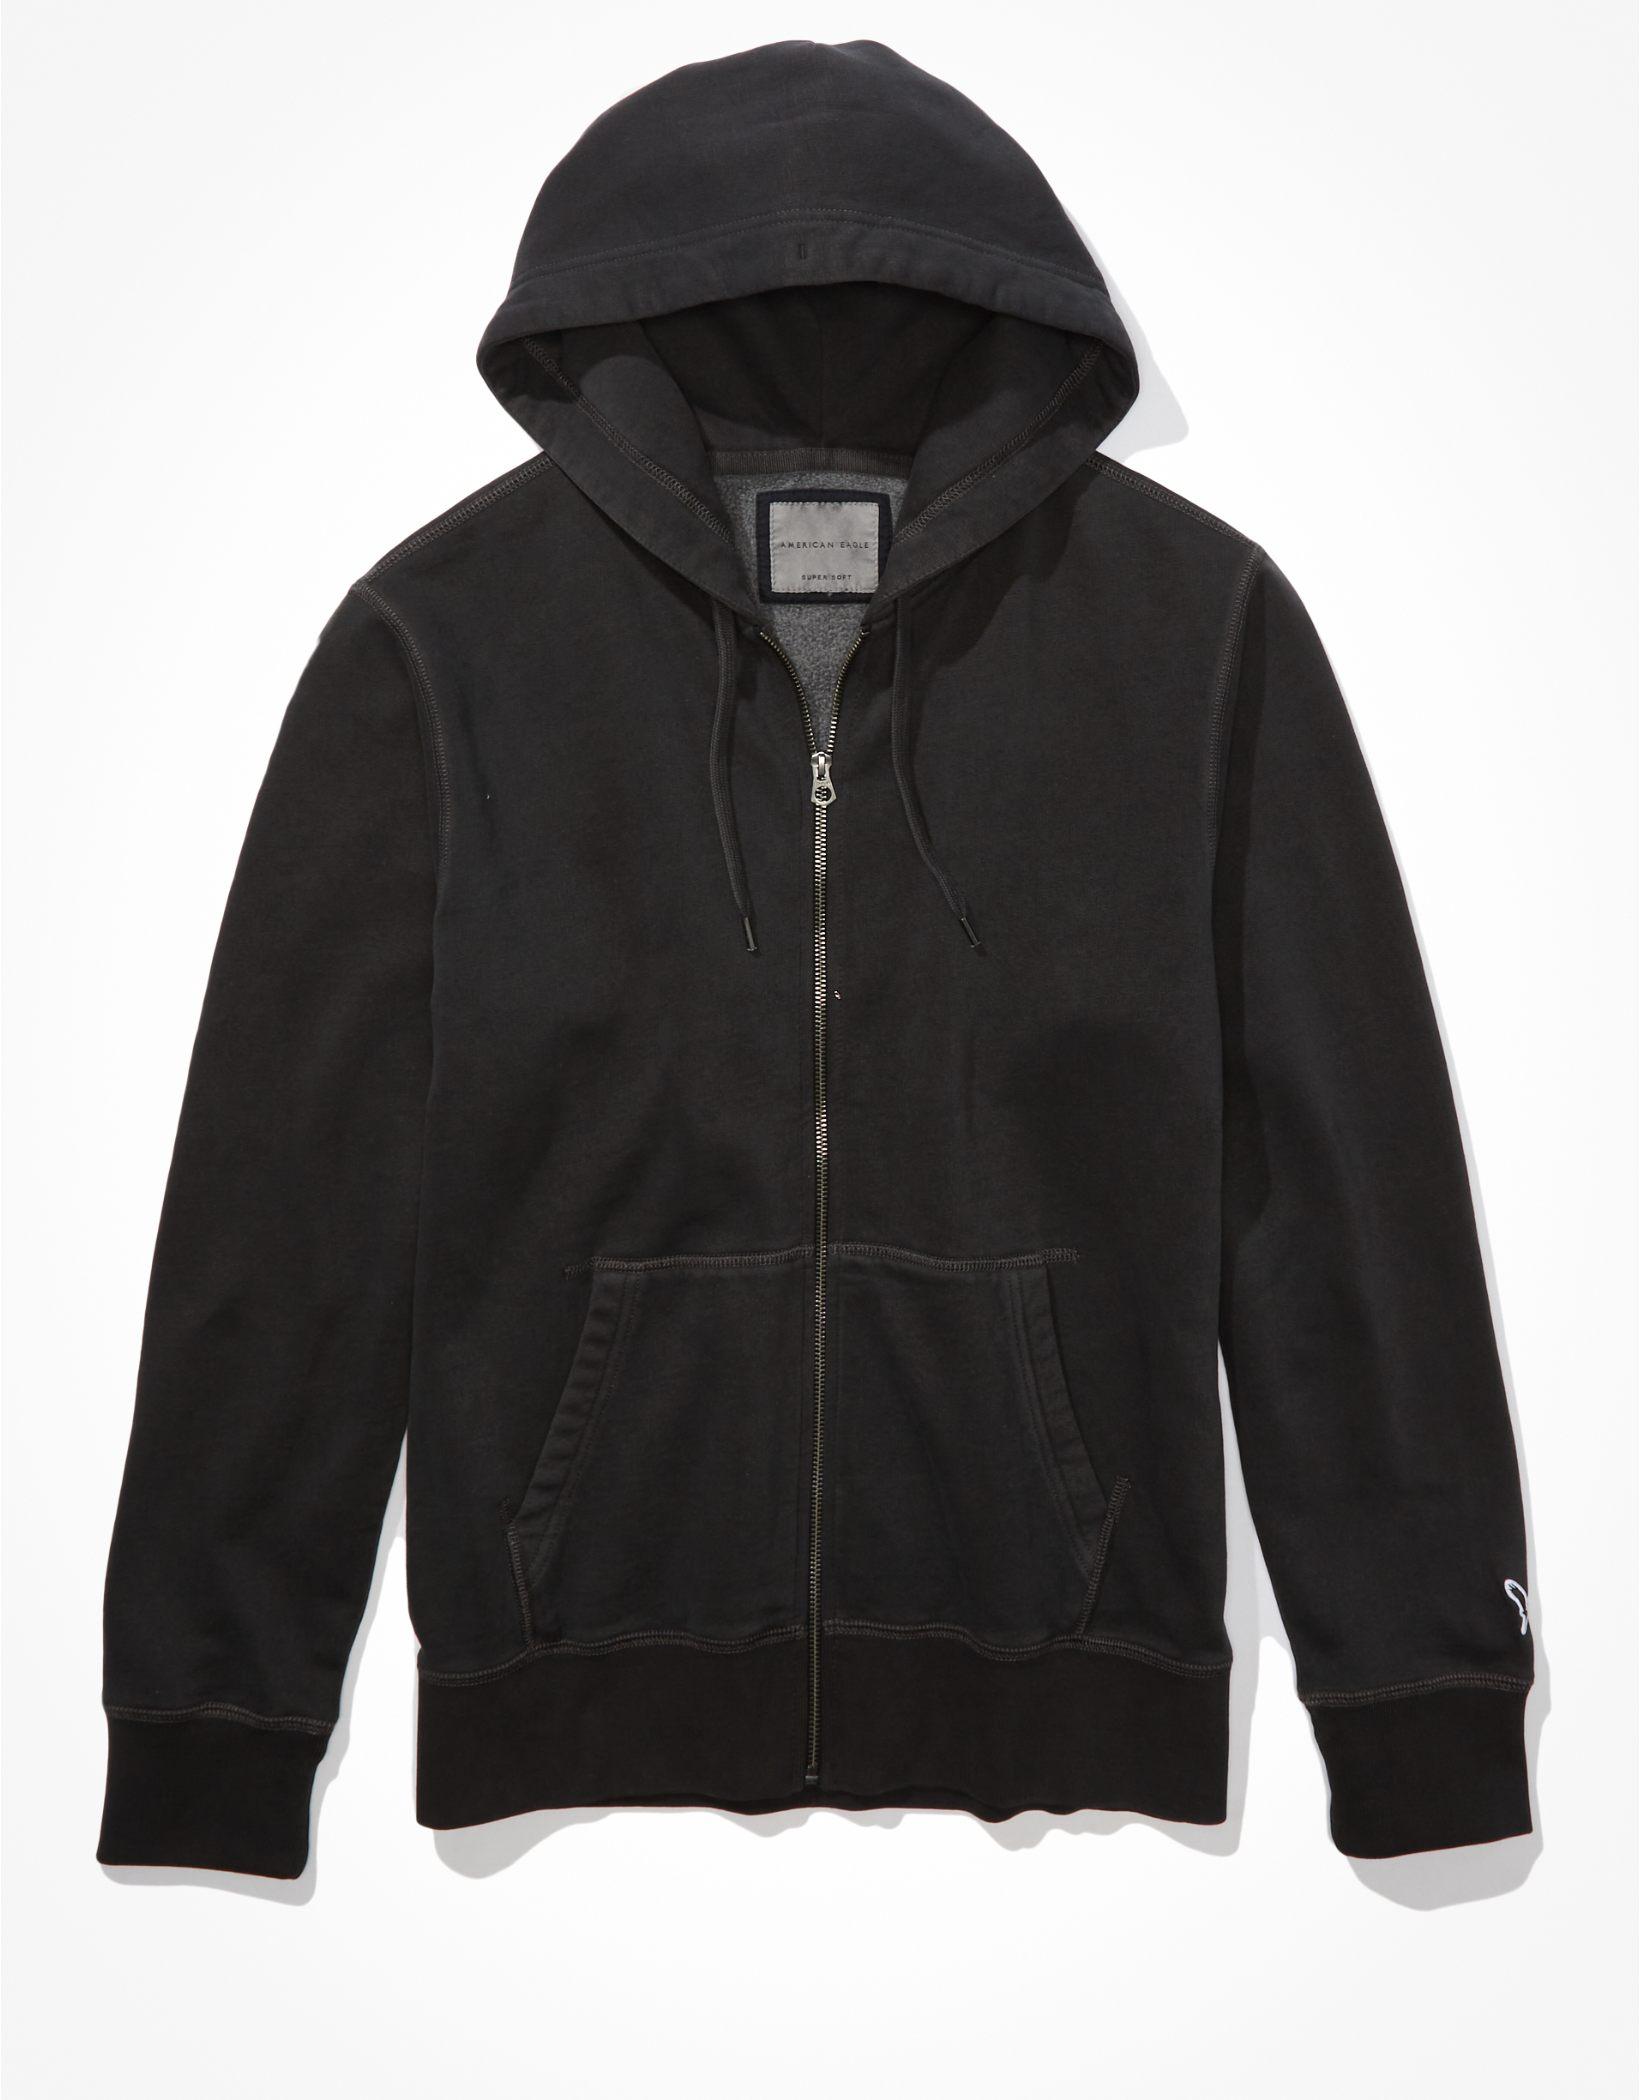 AE Super Soft Fleece Icon Zip-Up Hoodie